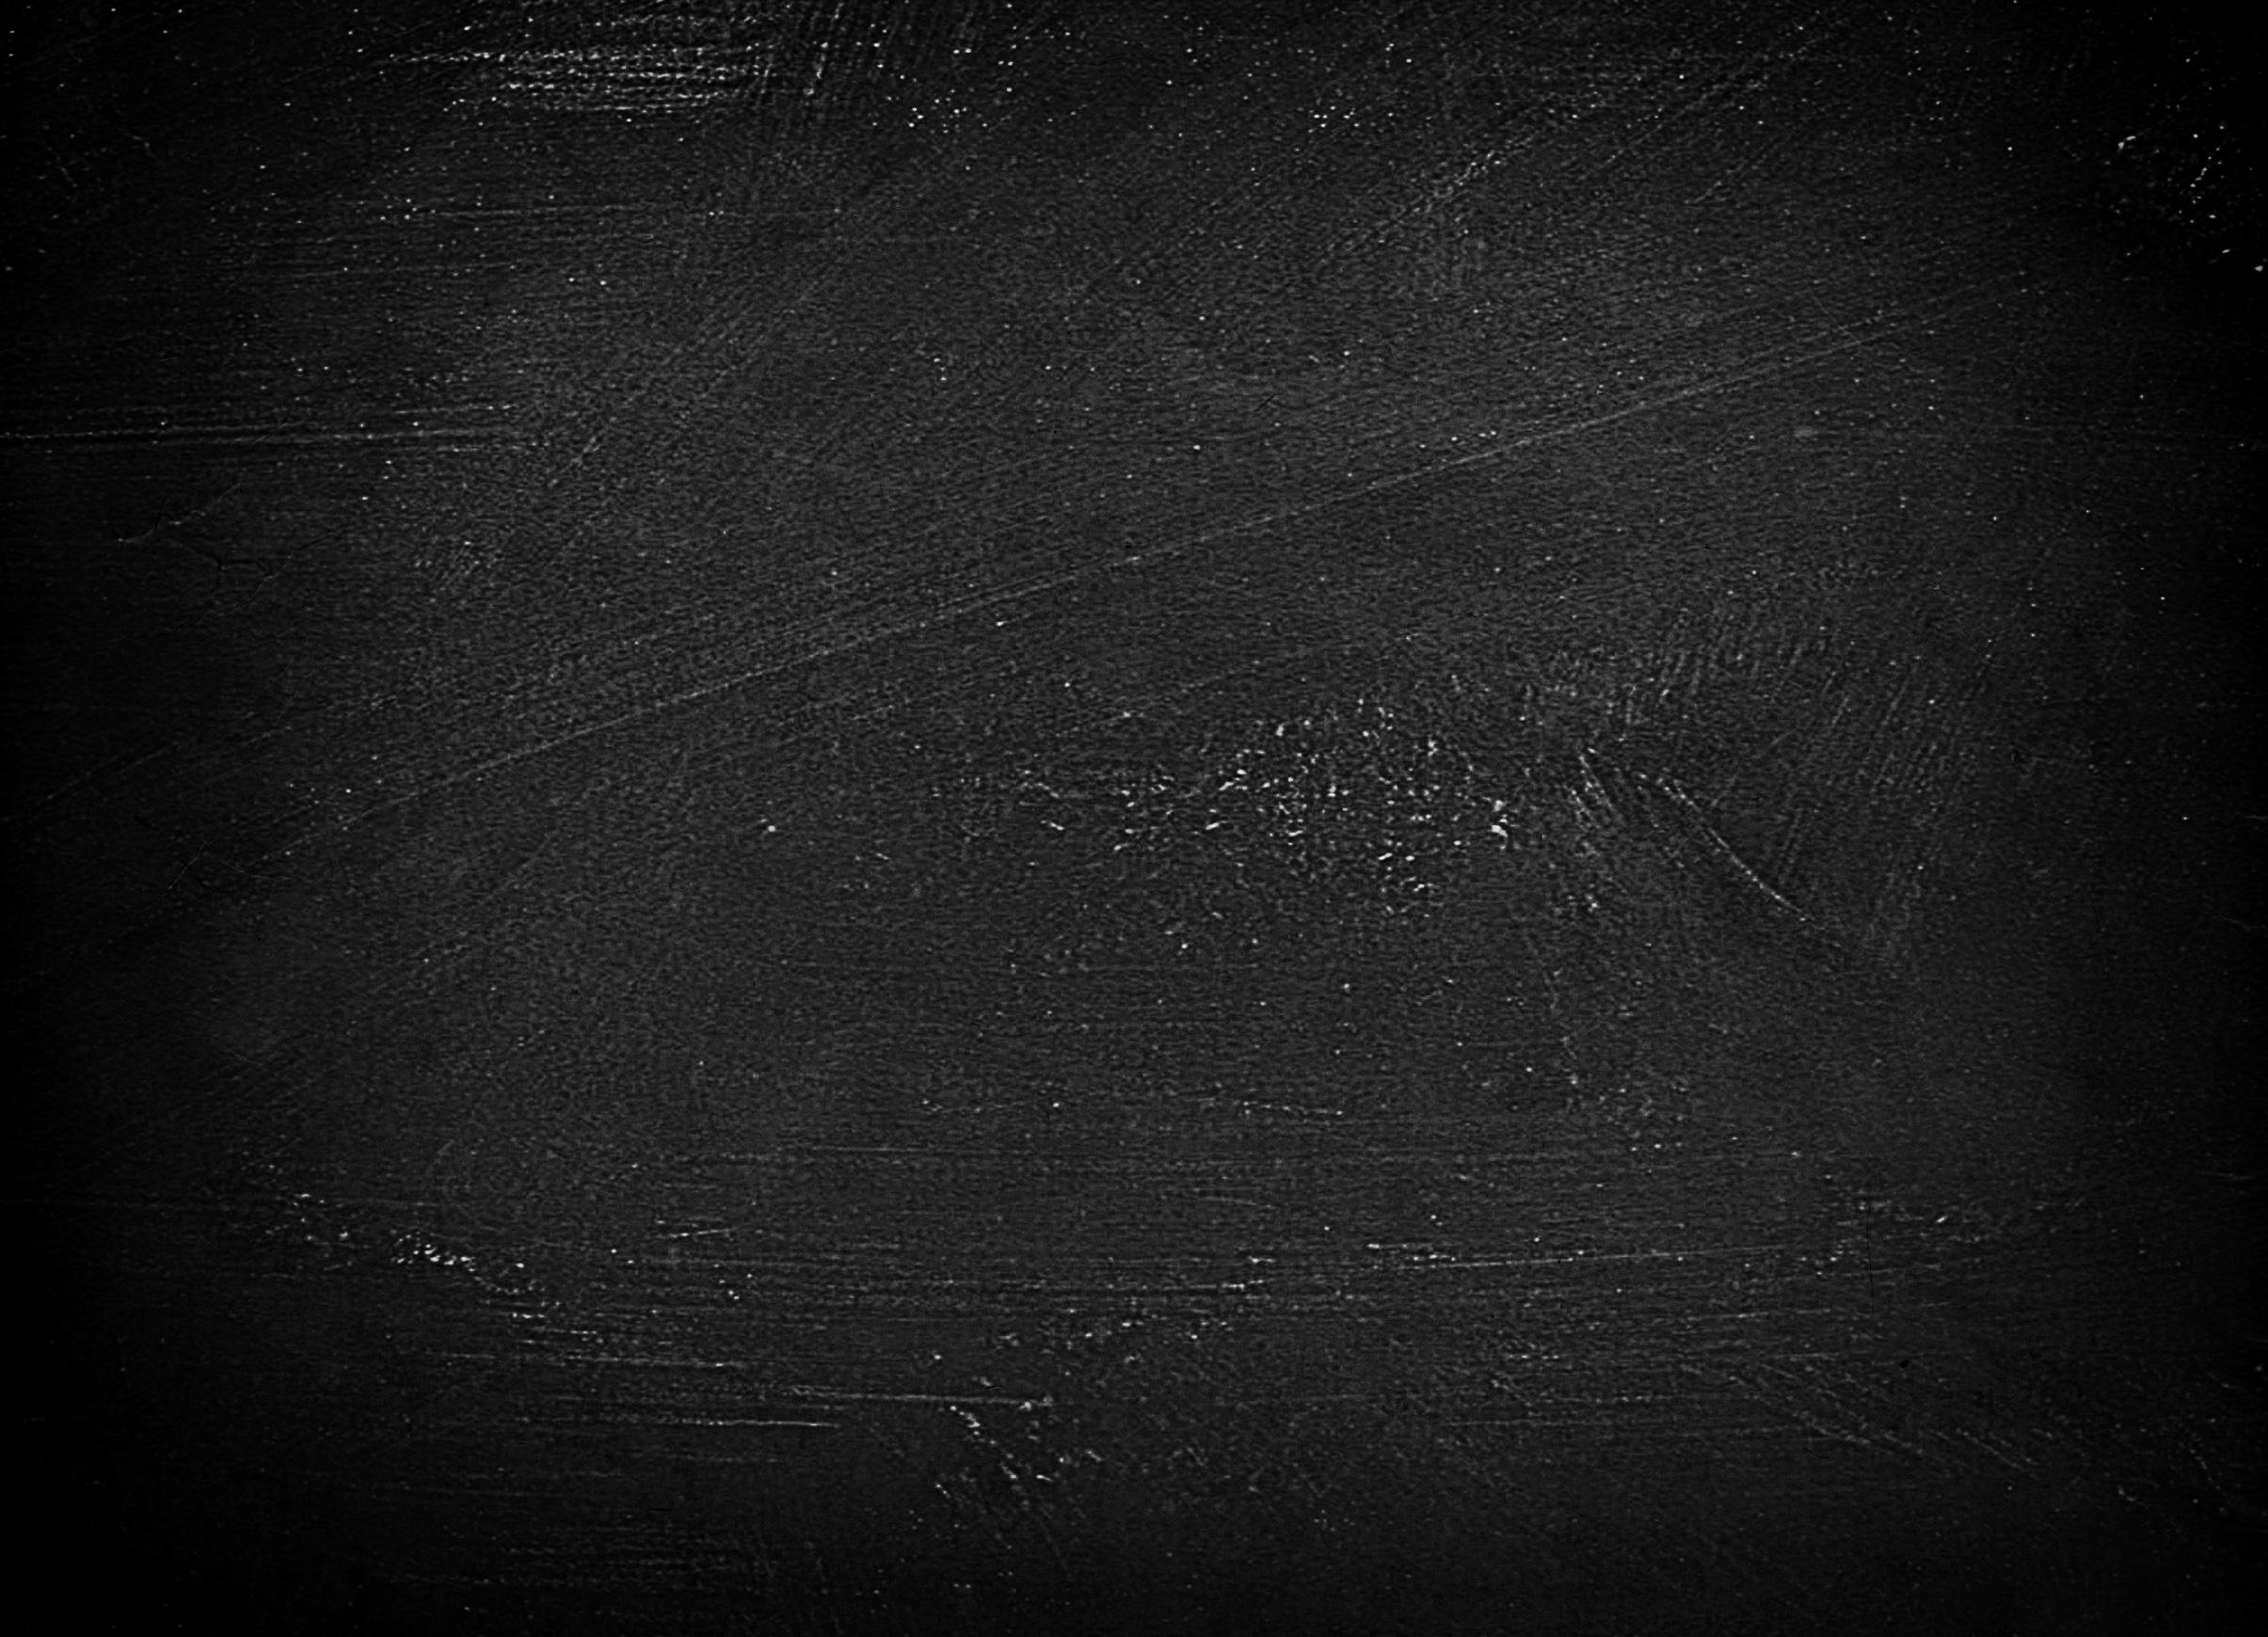 Classroom blackboard - Chalkboard texture, Abstract, Note, Pillar, Photograph, HQ Photo